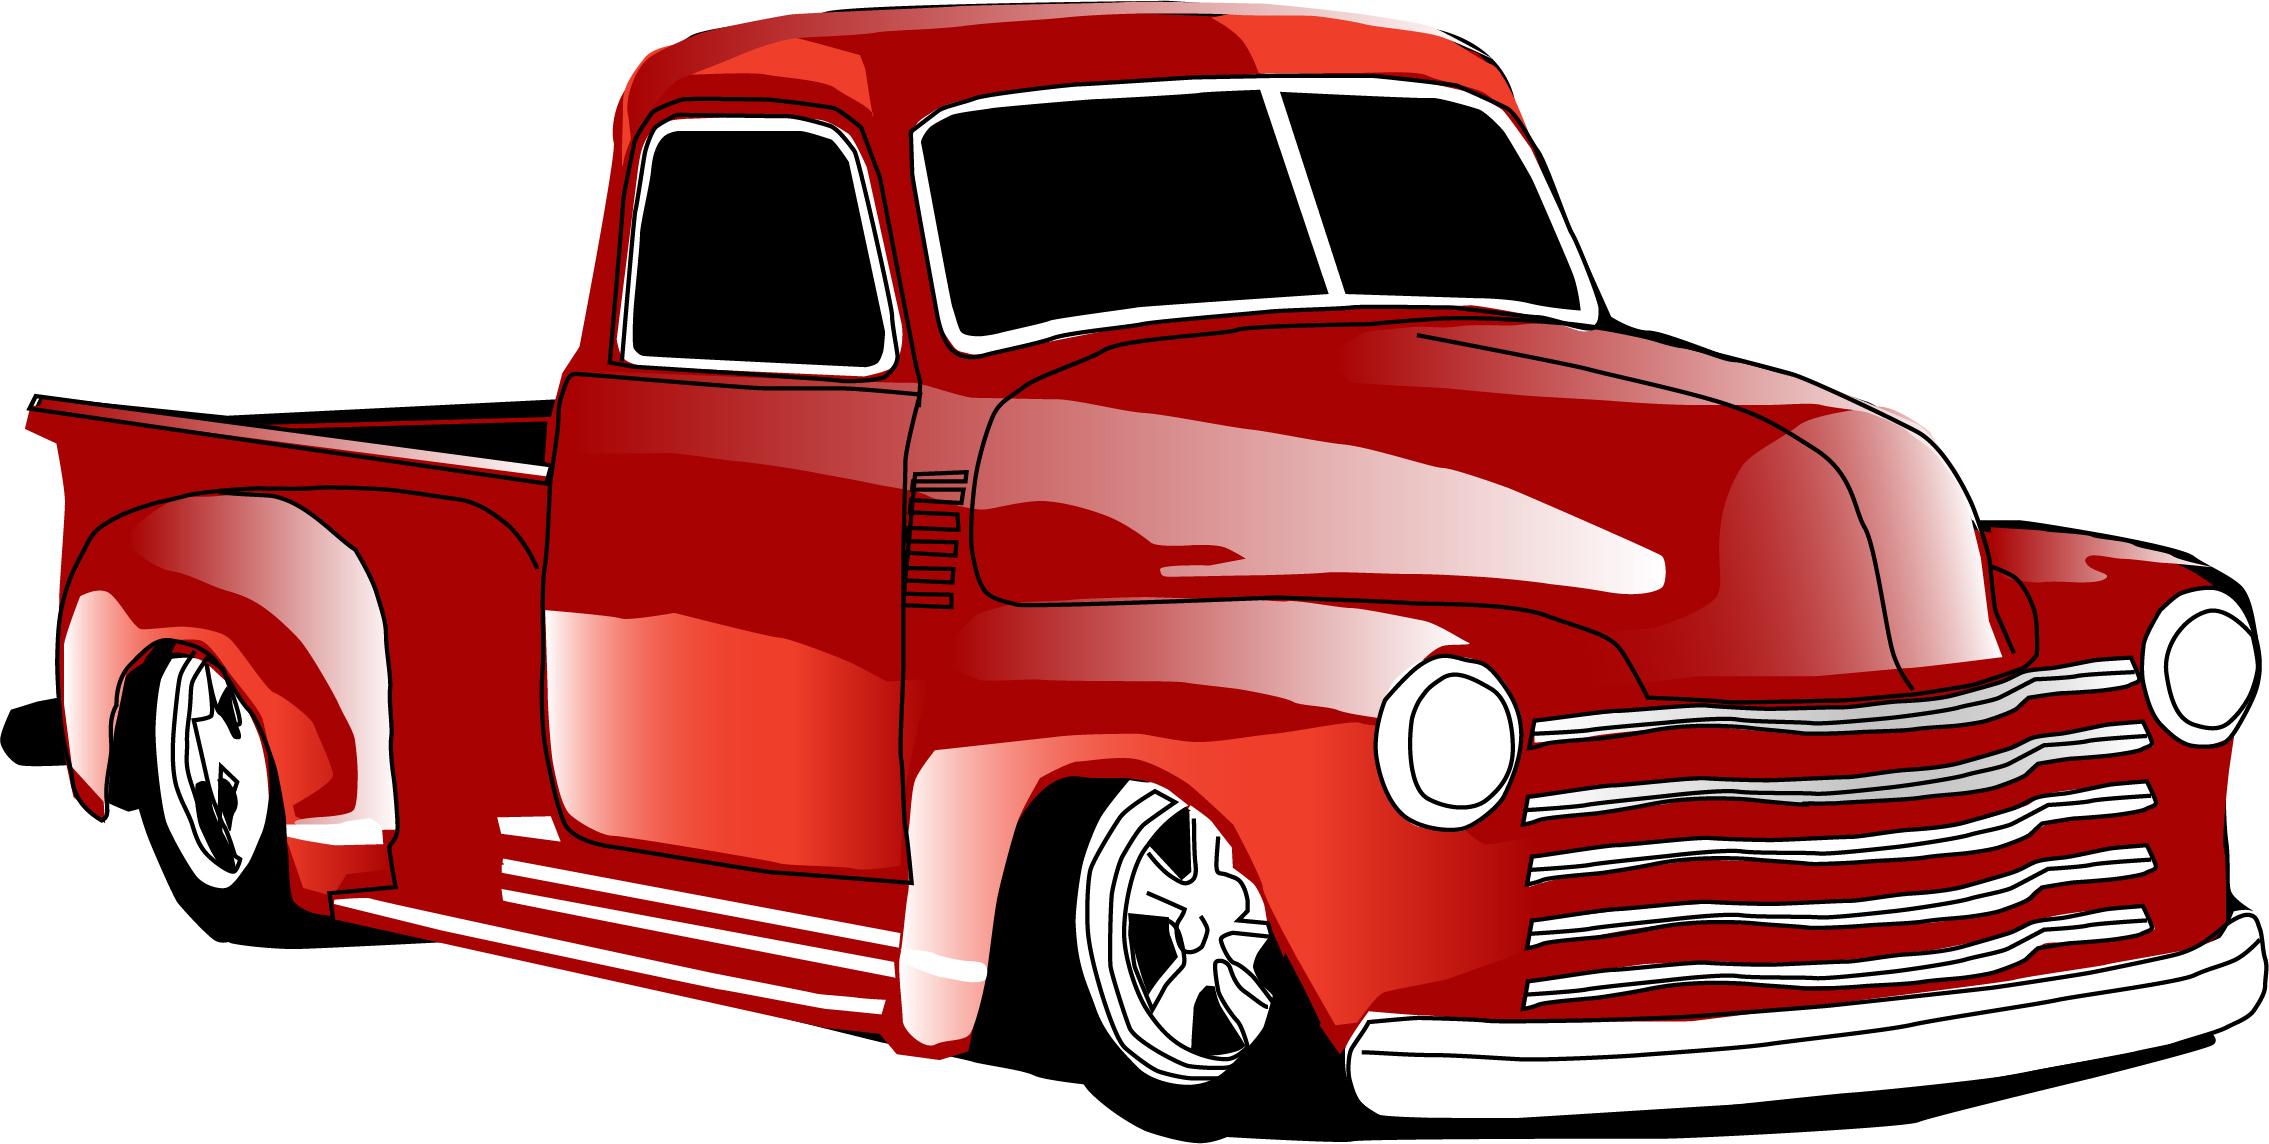 Chevy/GM Truck